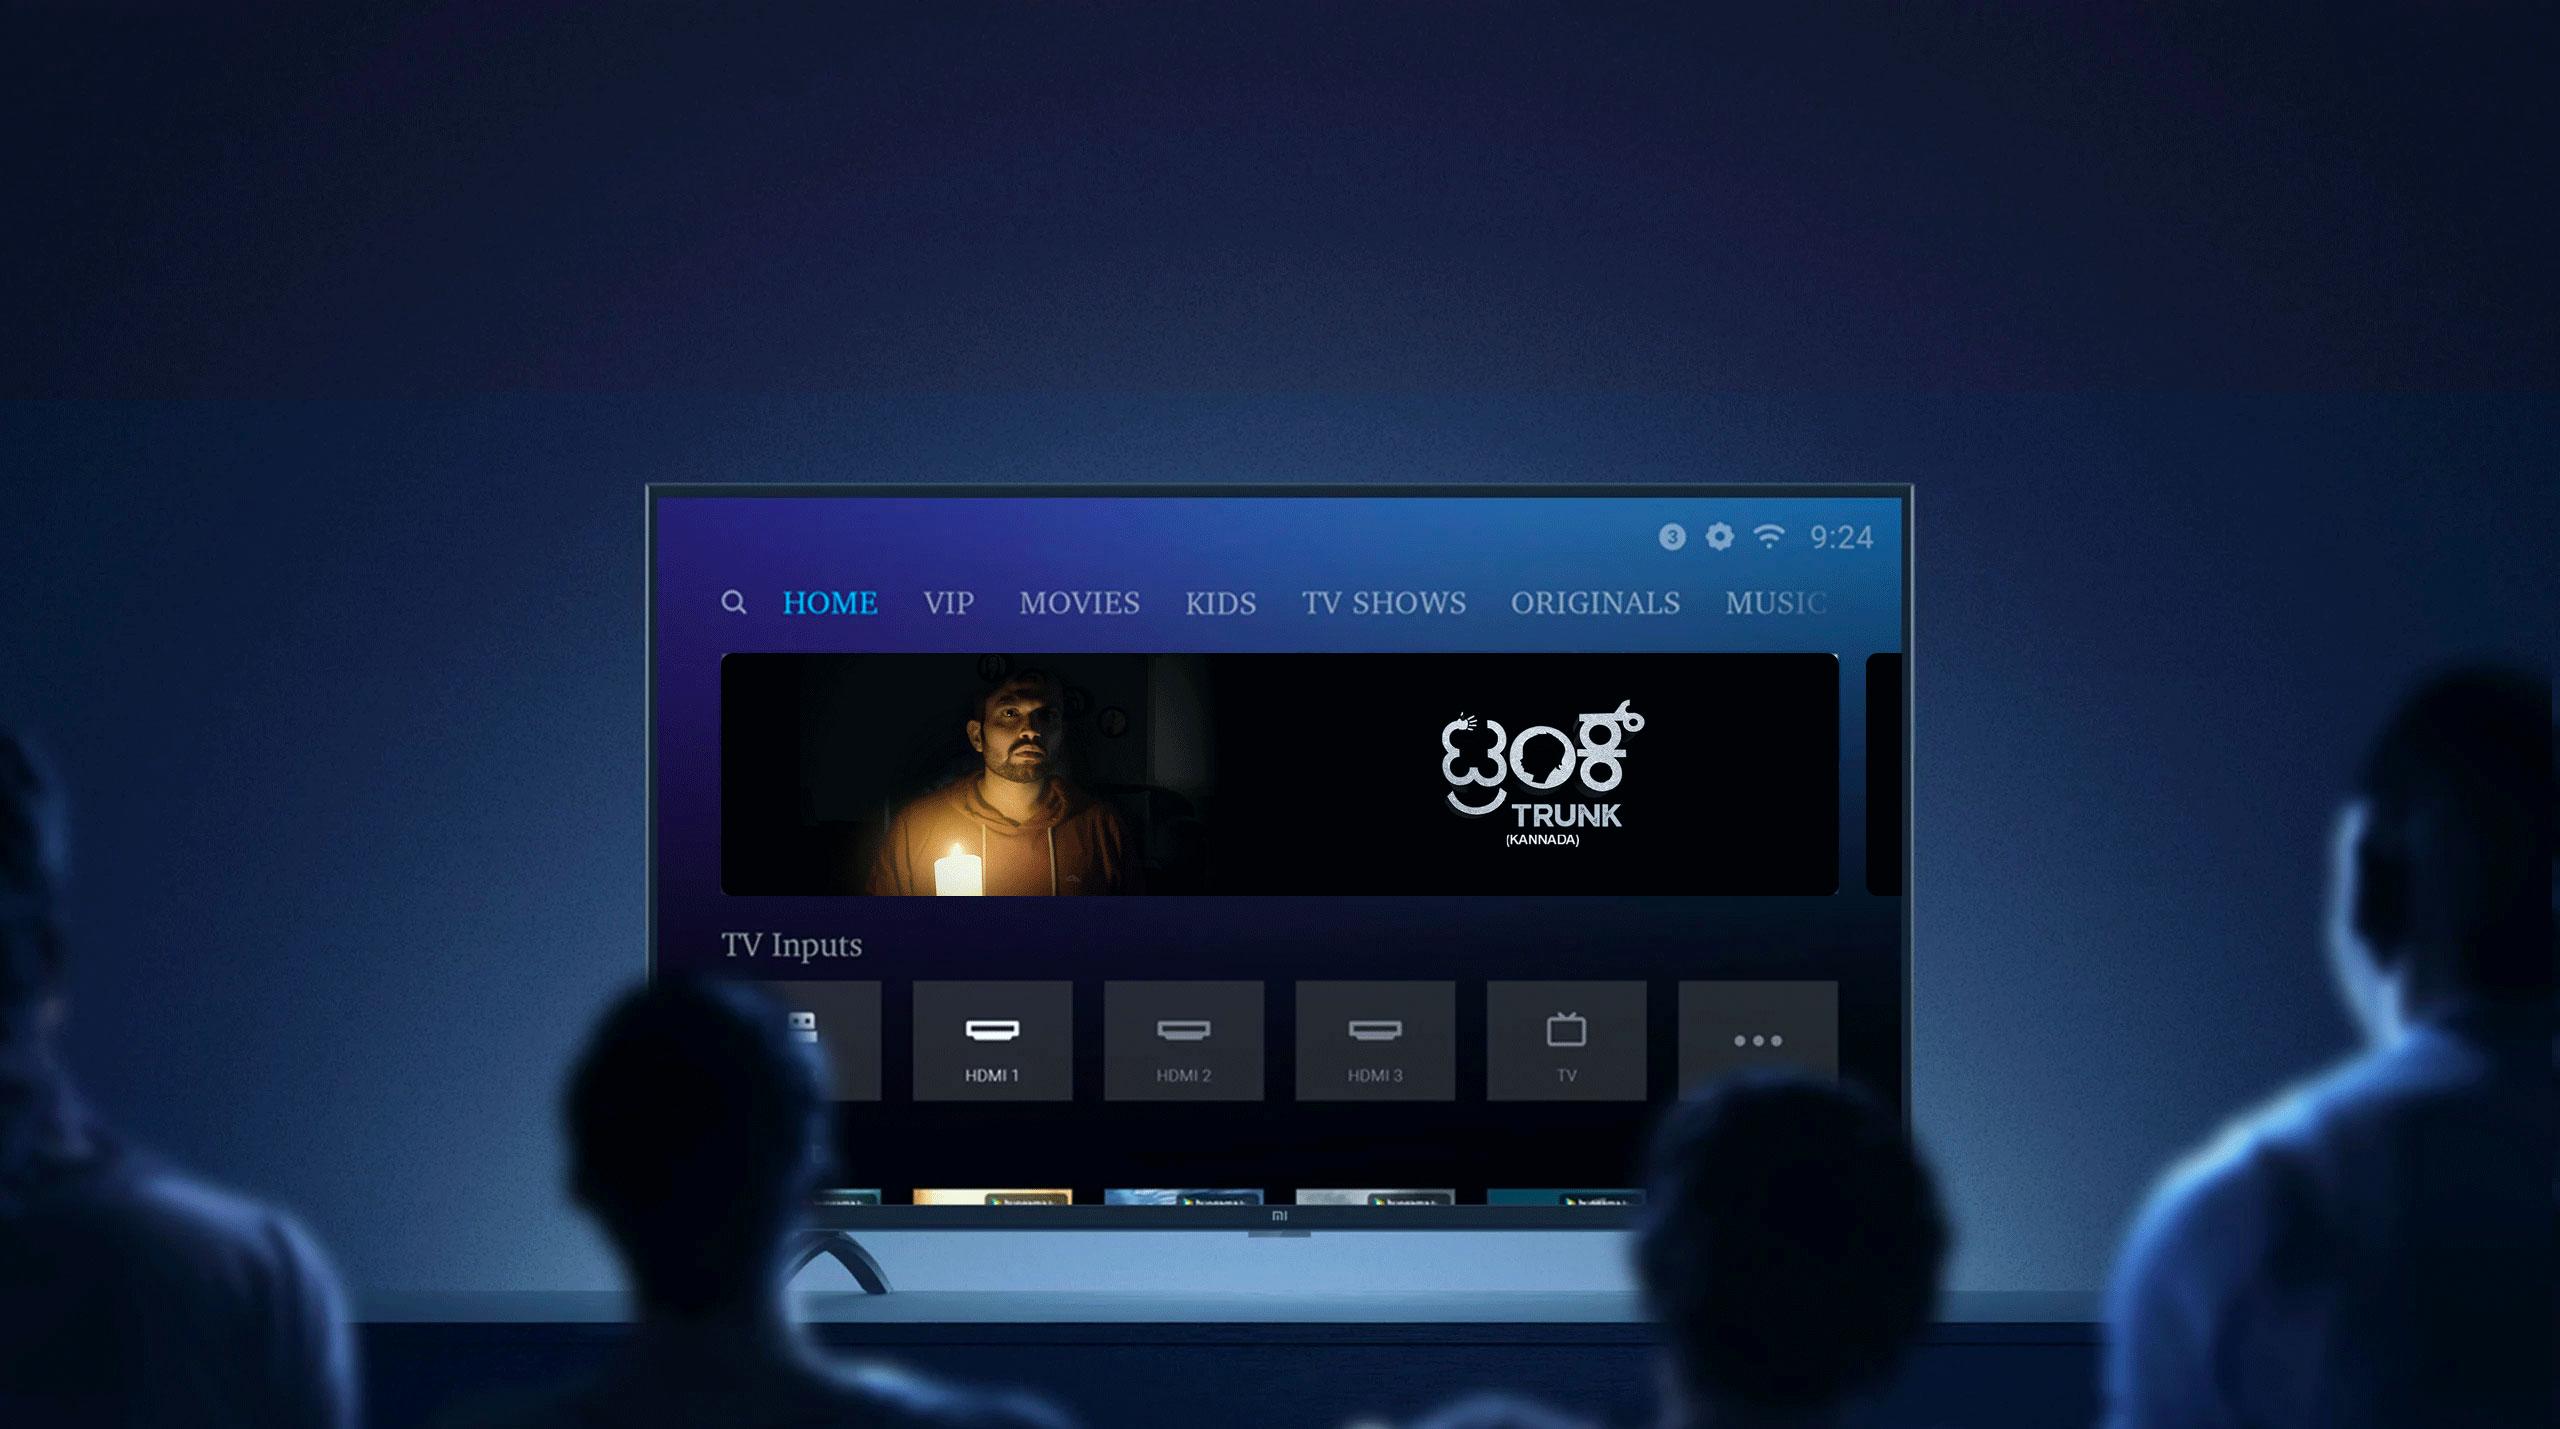 Mi LED TV 4A PRO 32